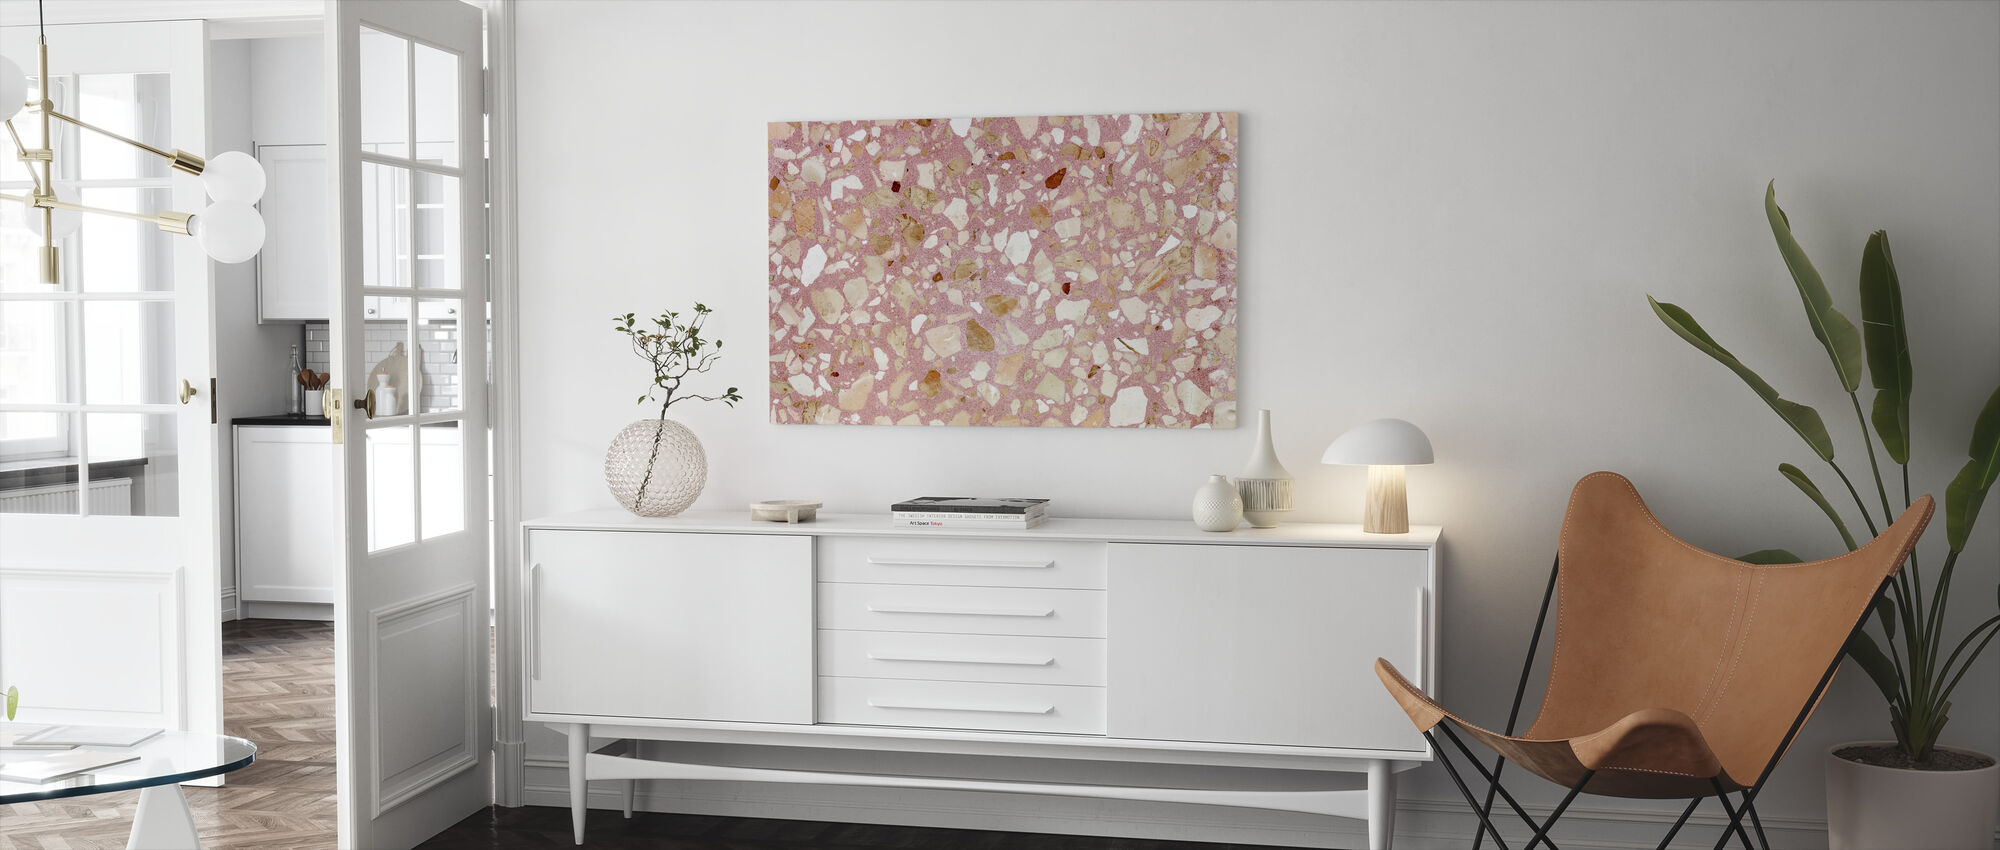 Pink Terrazzo Texturae - Canvastavla - Vardagsrum